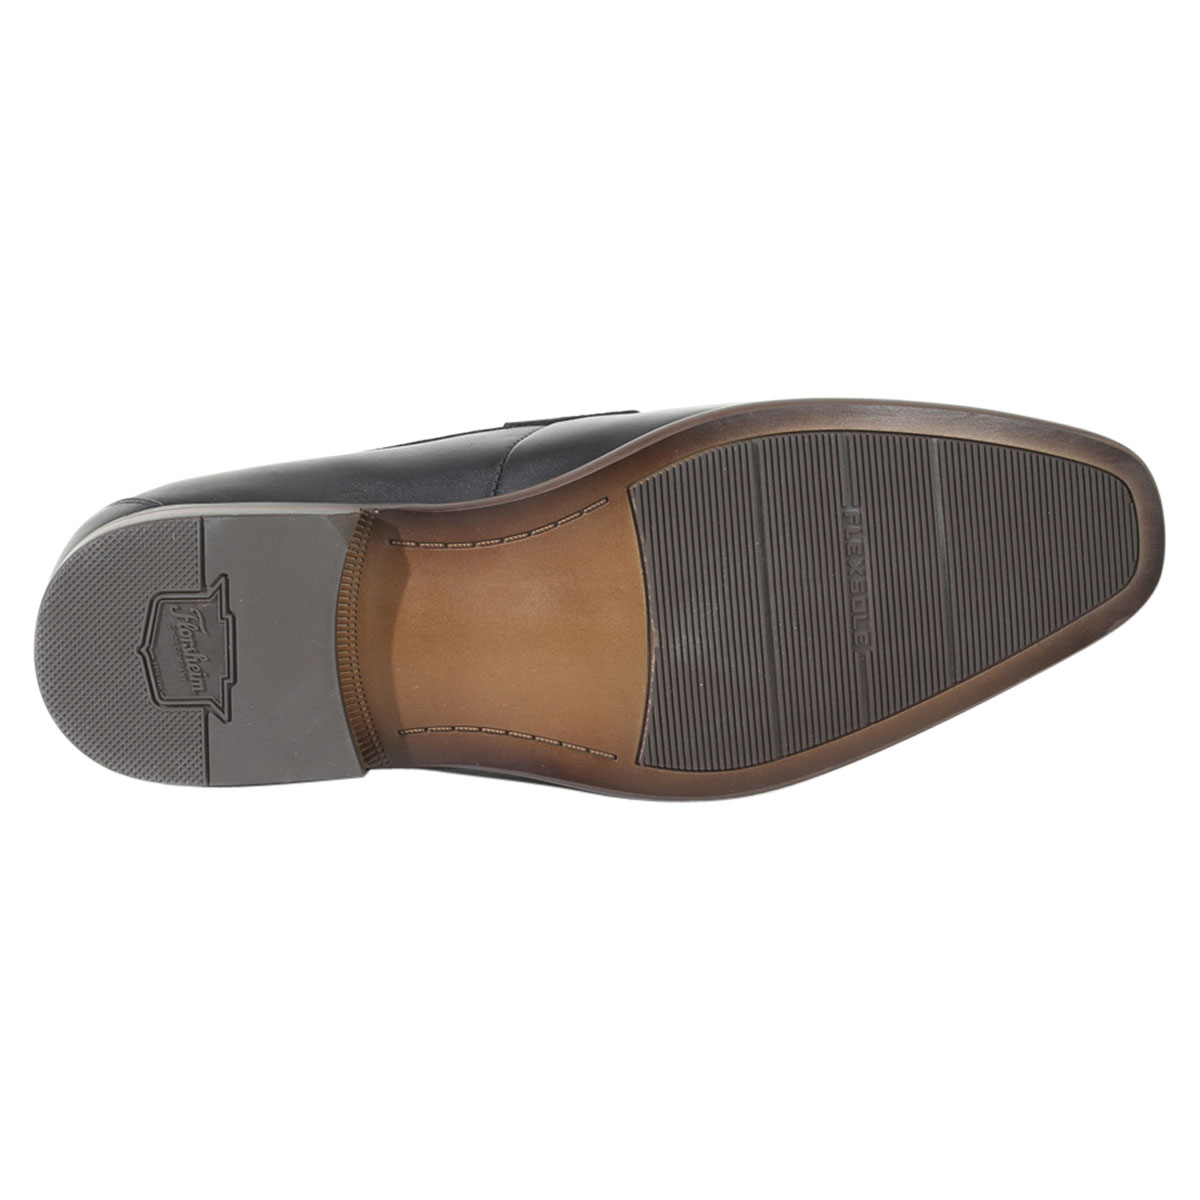 Florsheim-Men-039-s-Postino-Penny-Loafers-Shoes thumbnail 13